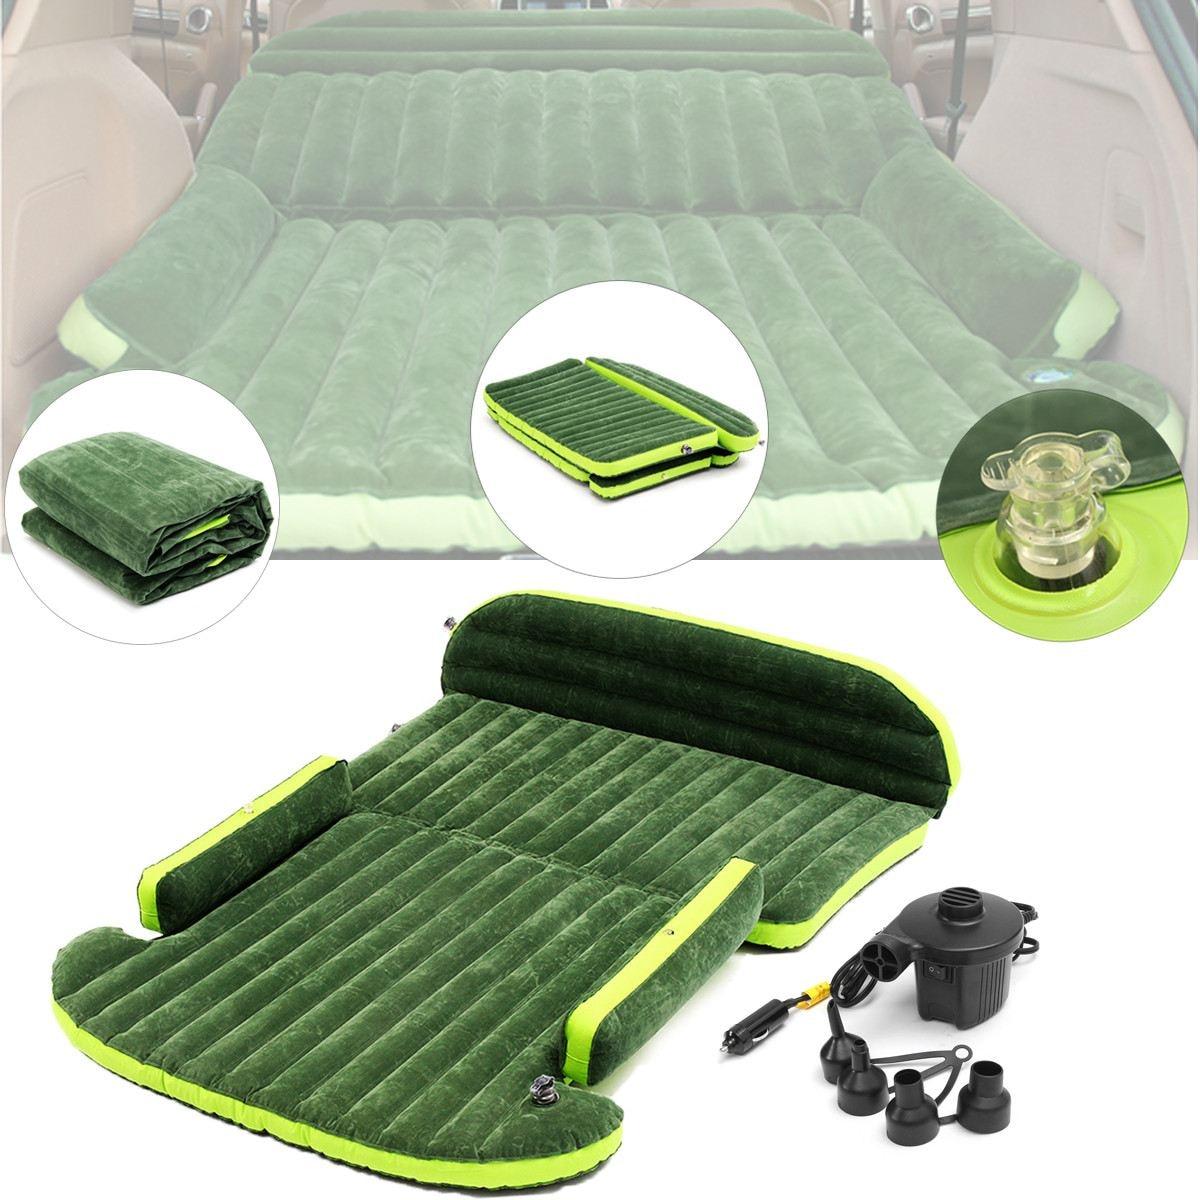 SUV Inflatable Air mattress with Air Pump Tapete Intex Car Back Seat Sleeping Rest Bed Camping Mat Mattresses 180cm x 128cm durable thicken pvc car travel inflatable bed automotive air mattress camping mat with air pump